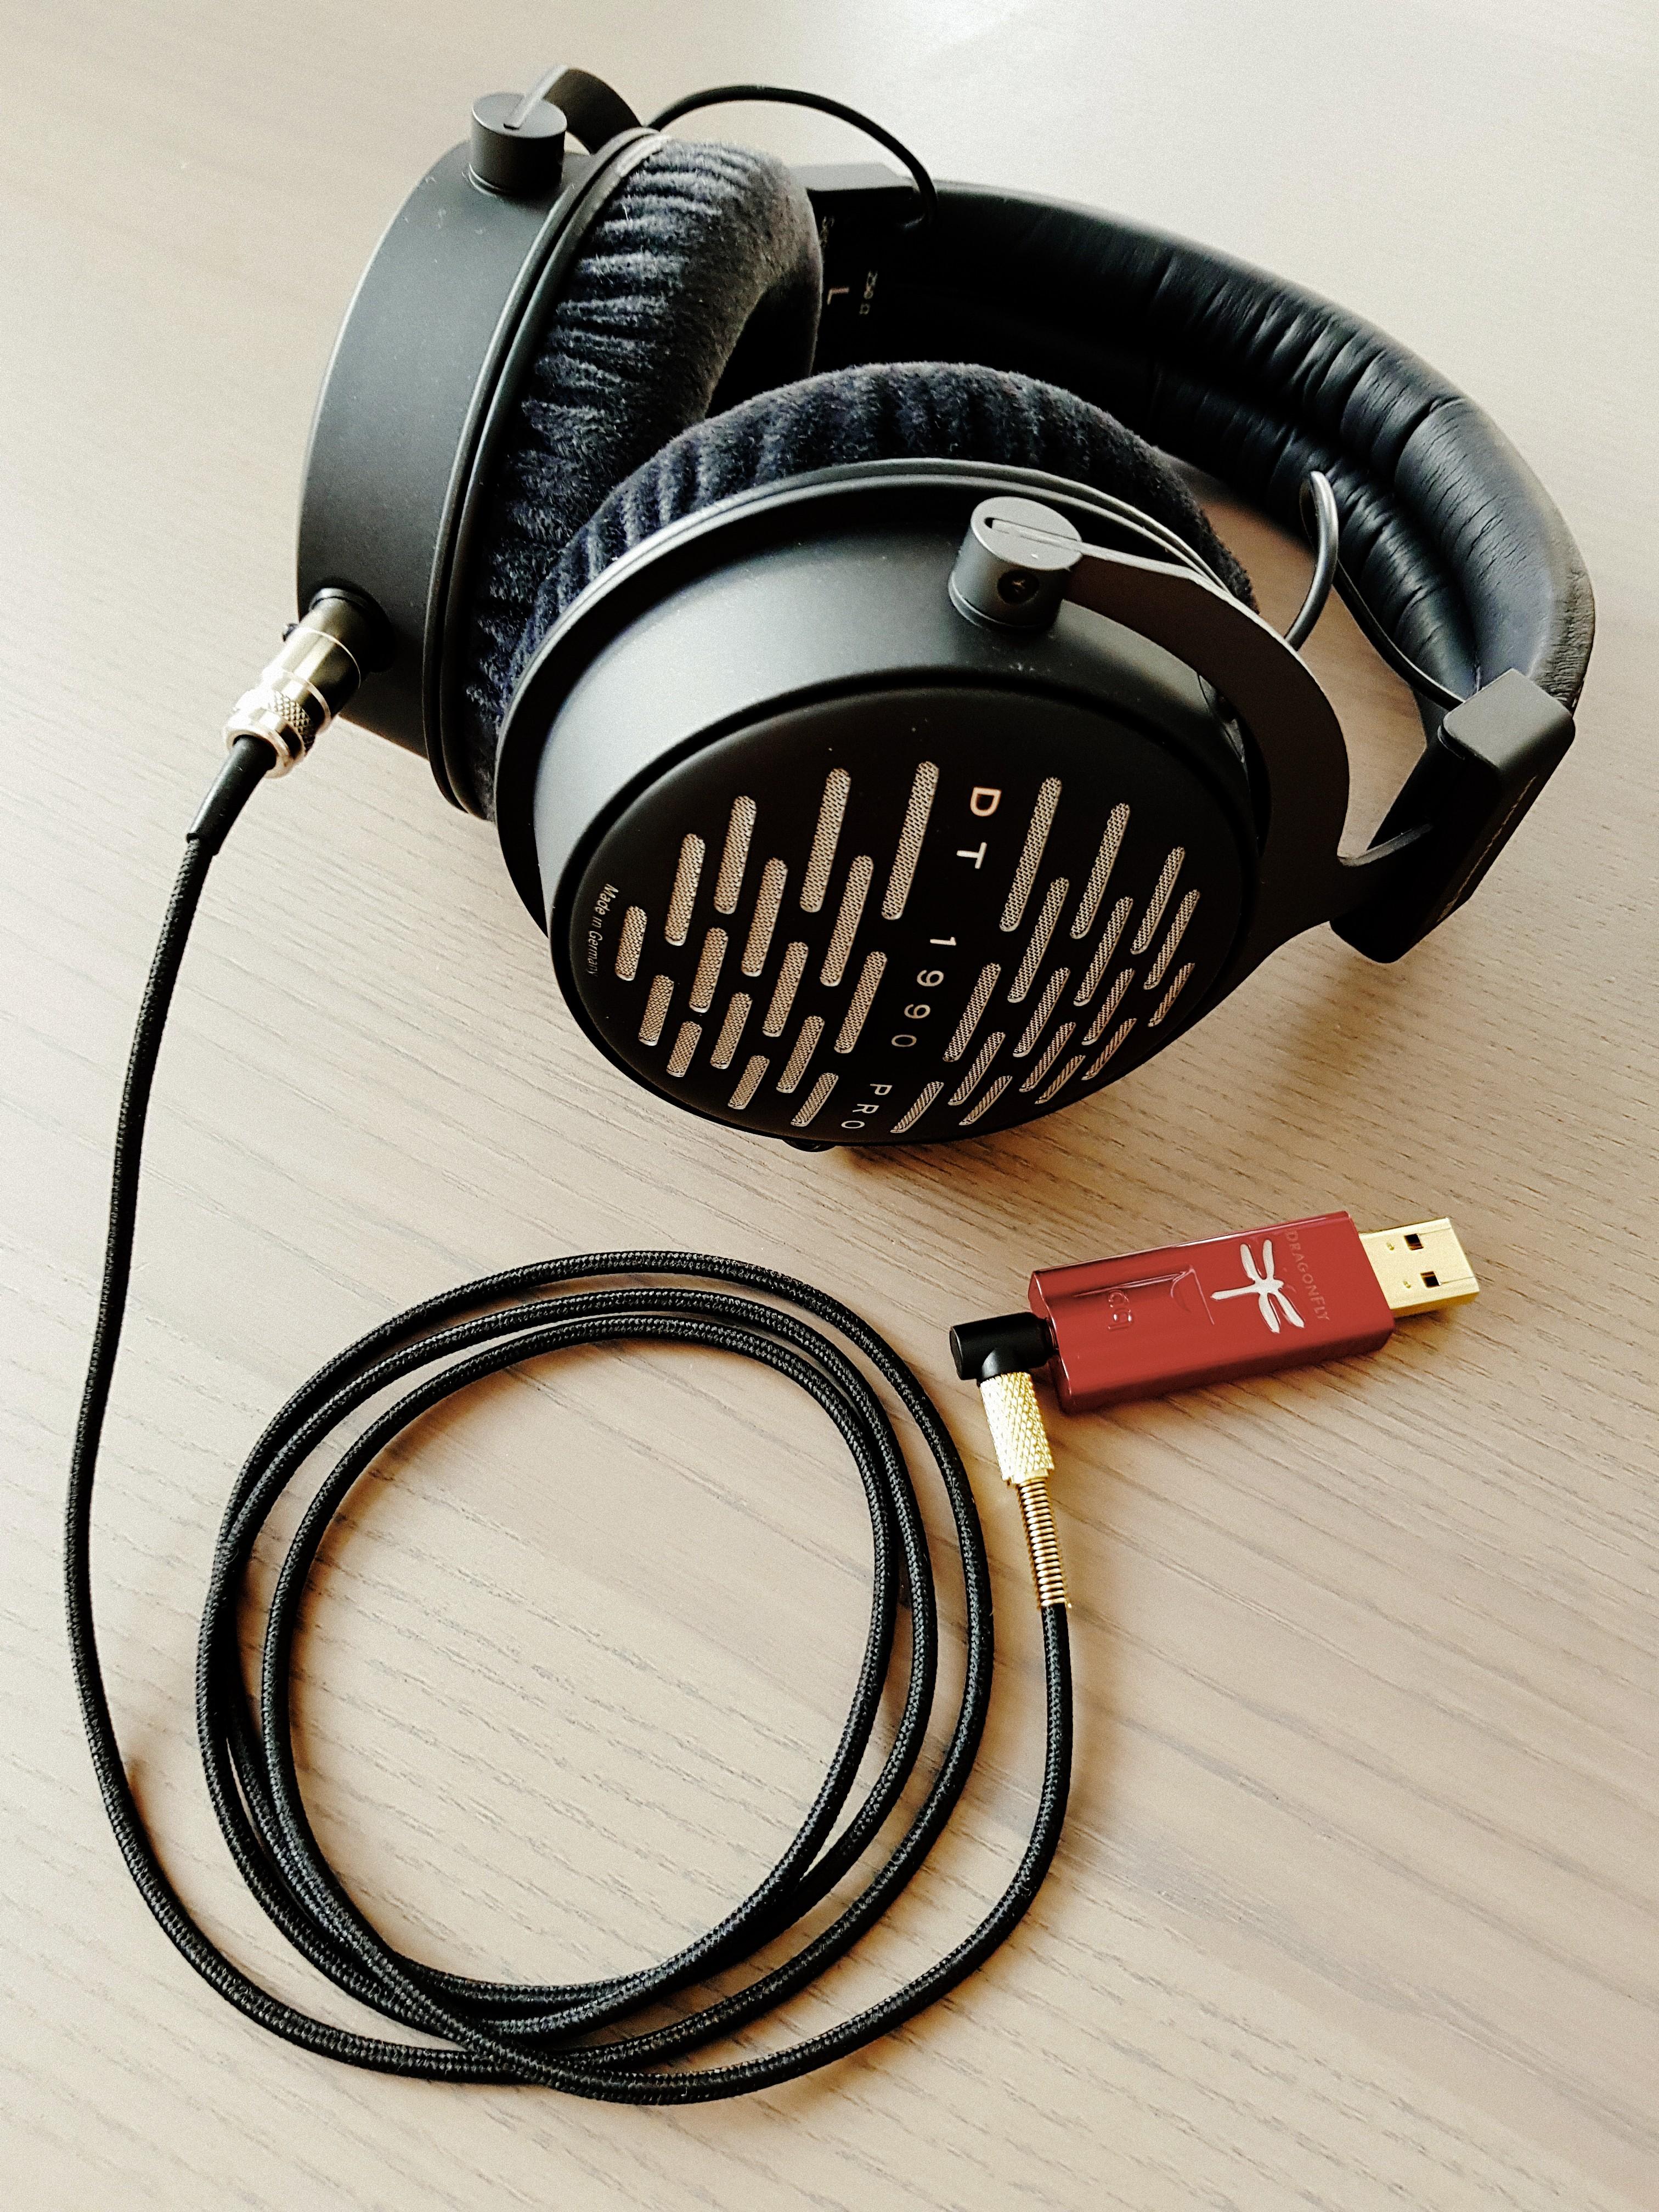 beyerdynamic dt 1990 pro beyer 39 s open back mastering headphone page 76 headphone reviews. Black Bedroom Furniture Sets. Home Design Ideas